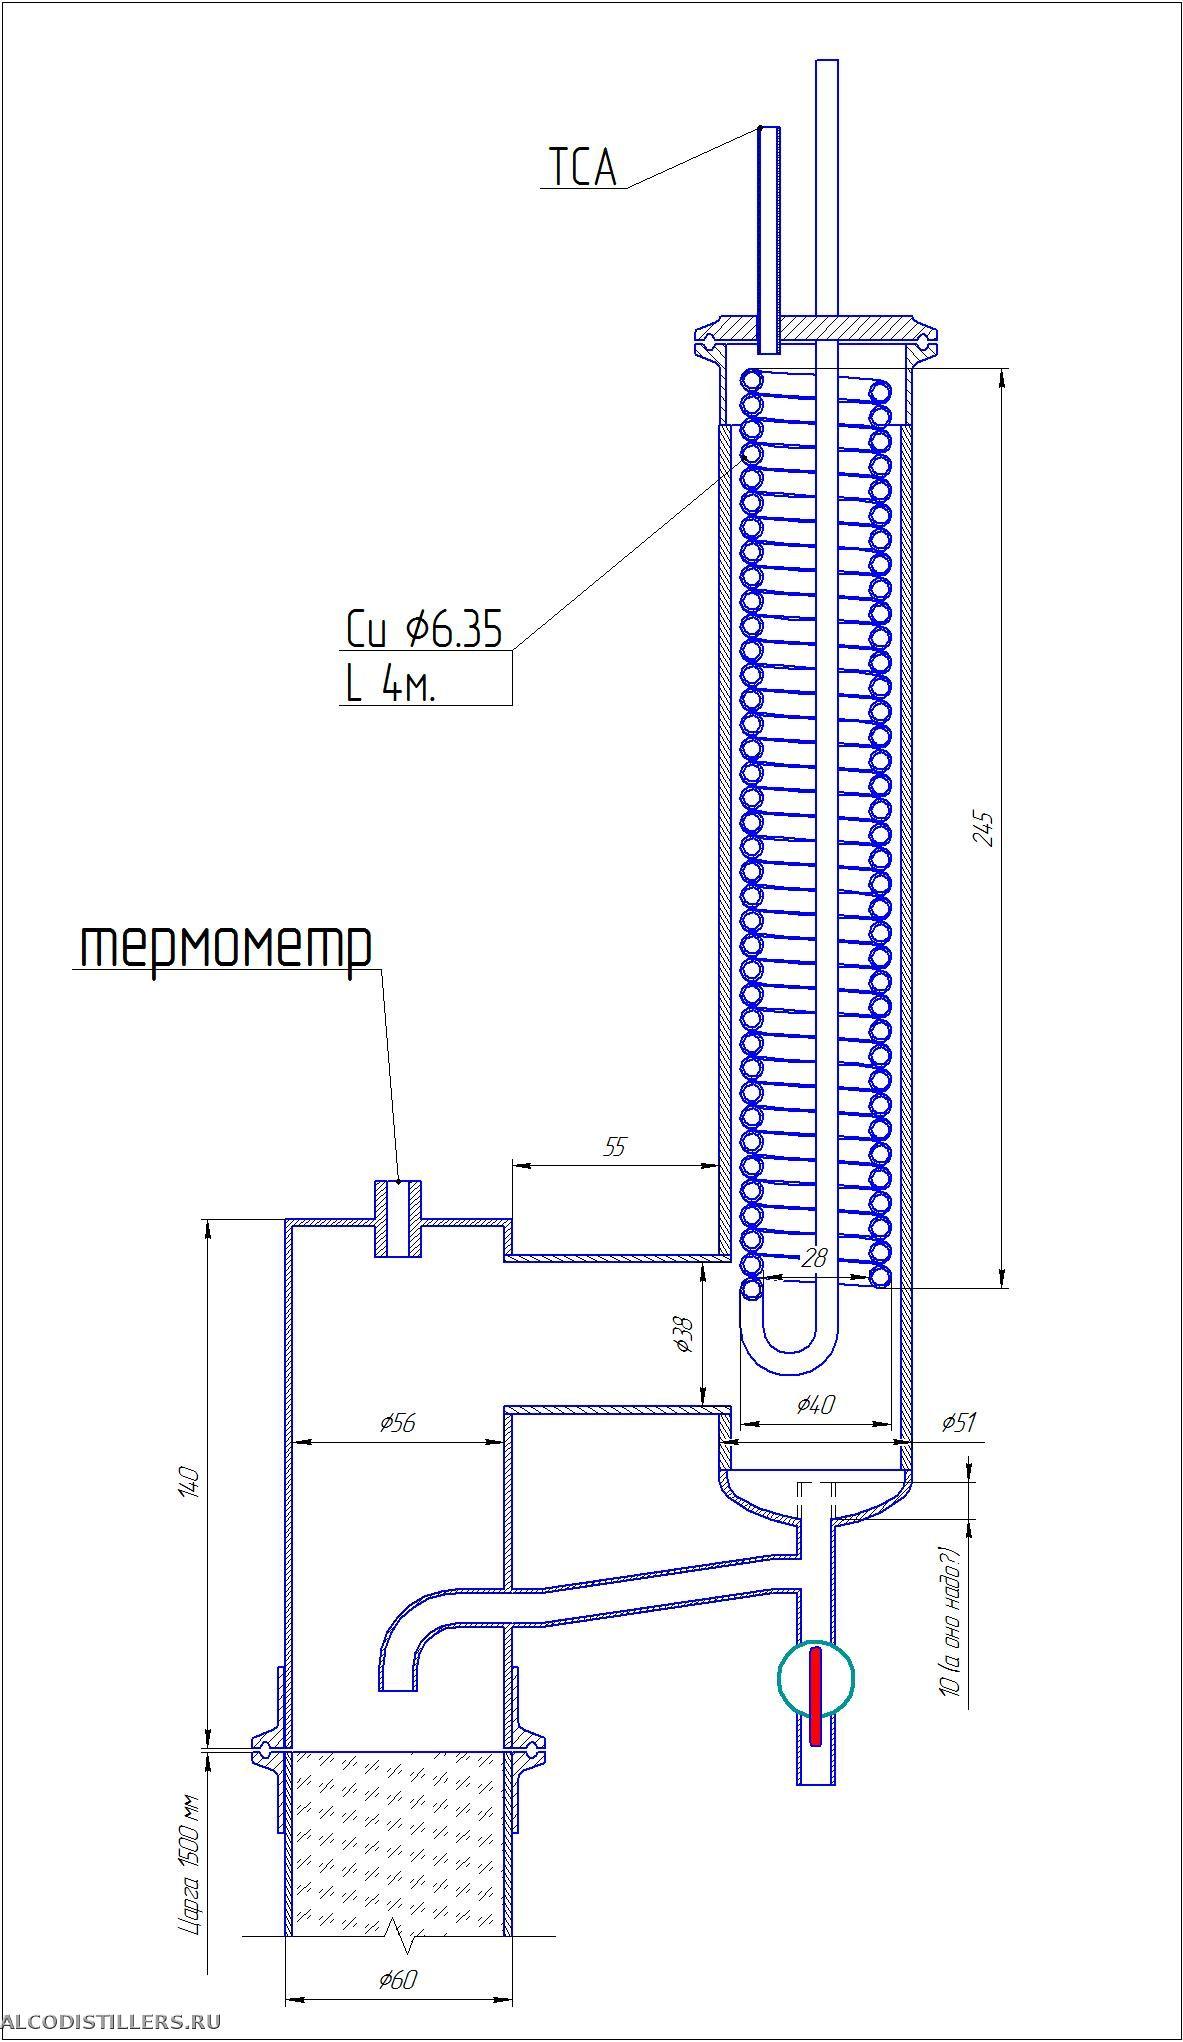 Как устроен дефлегматор для самогонного аппарата